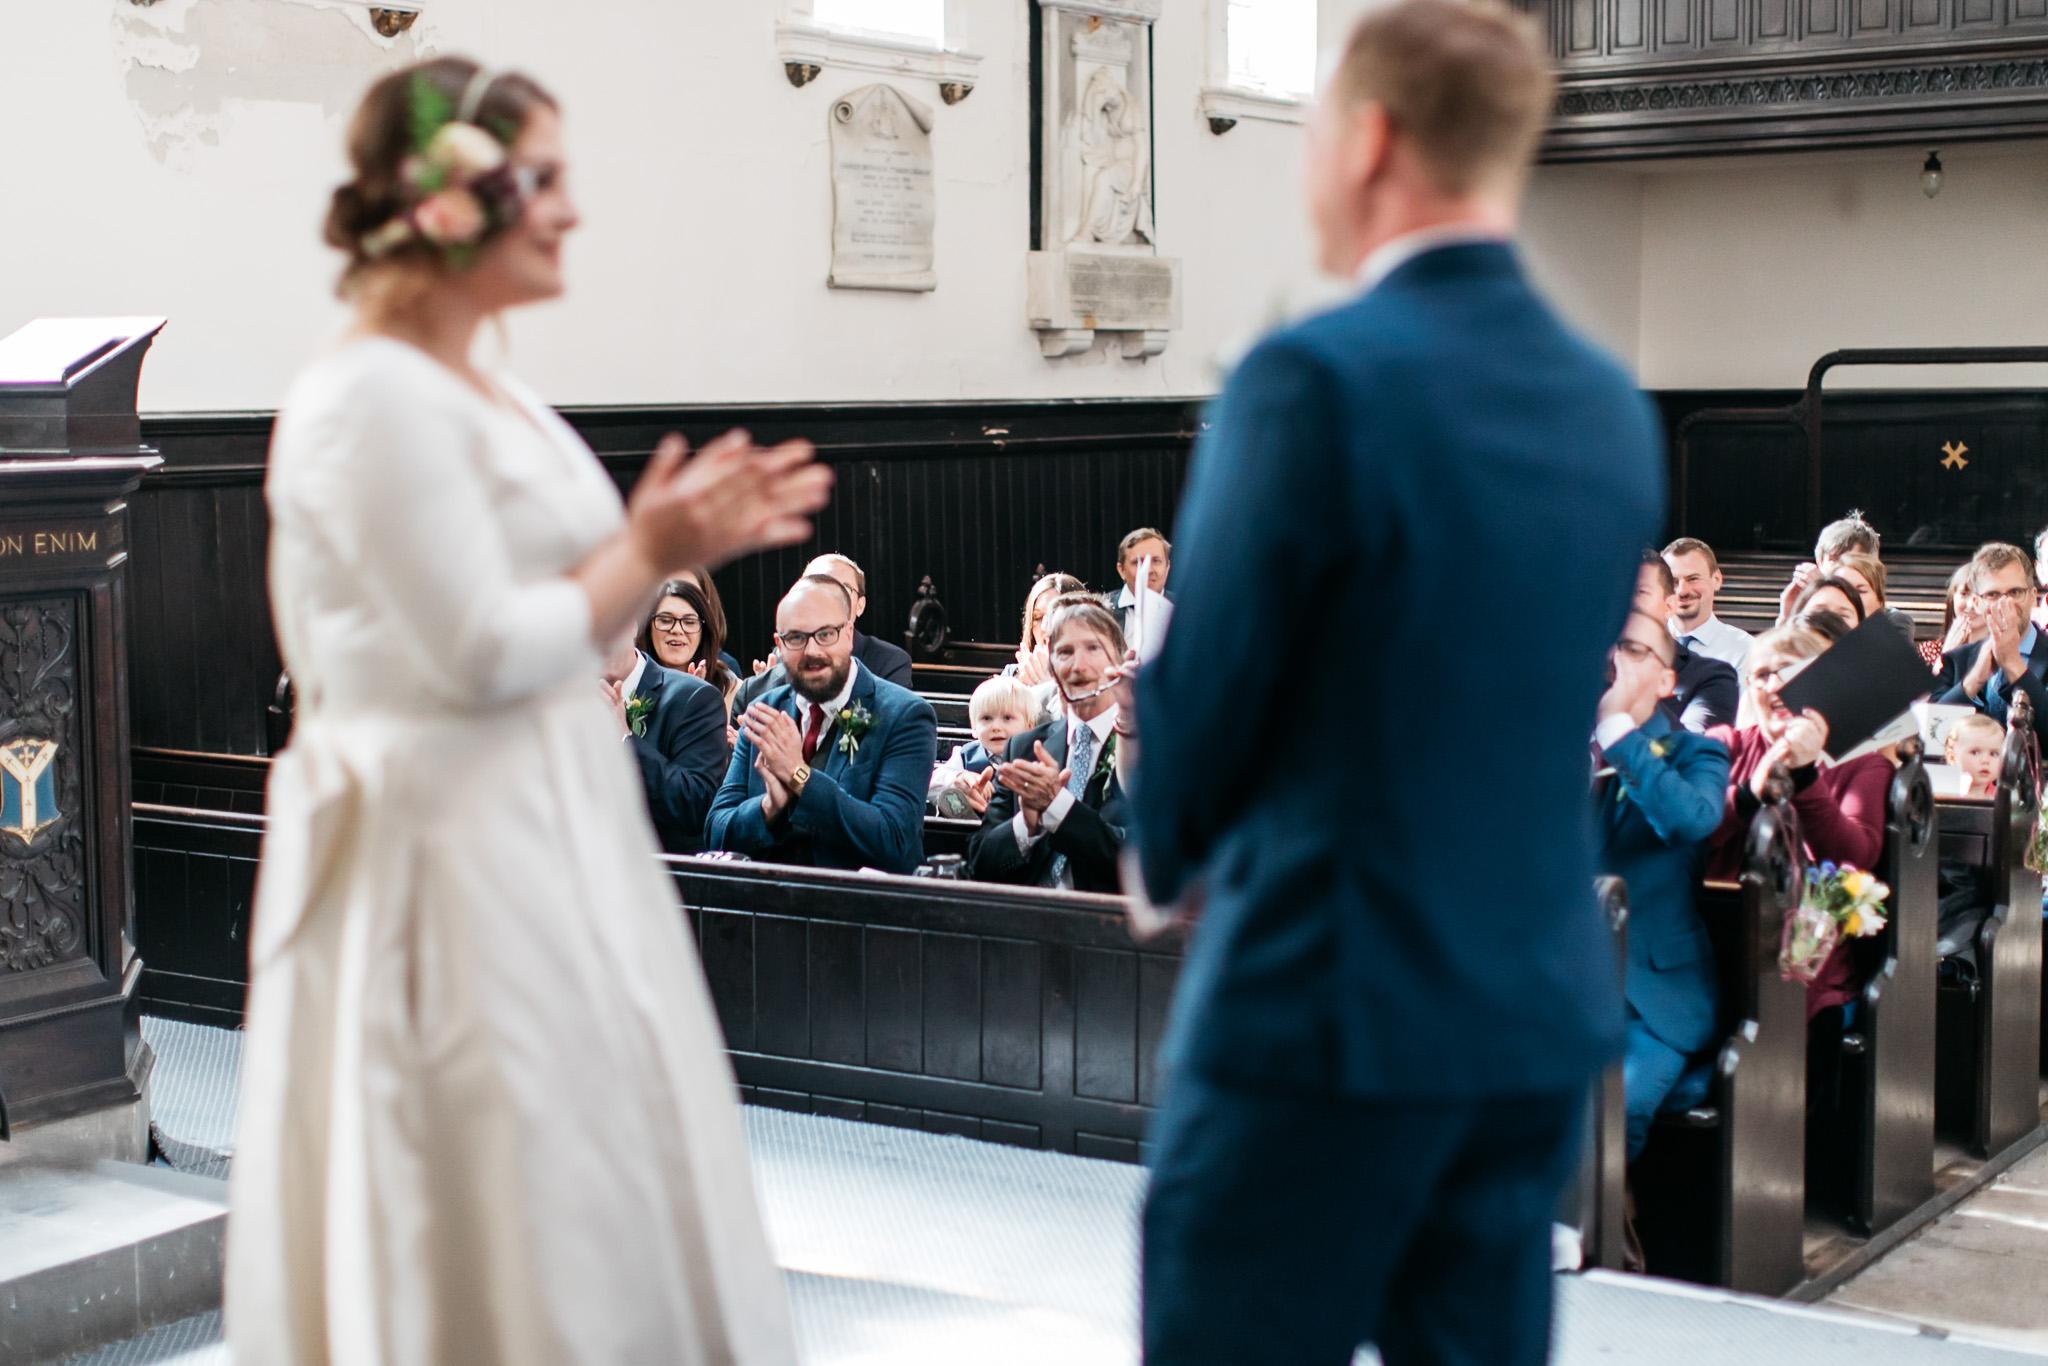 st_andrews_fabrica_brighton_wedding_562.jpg